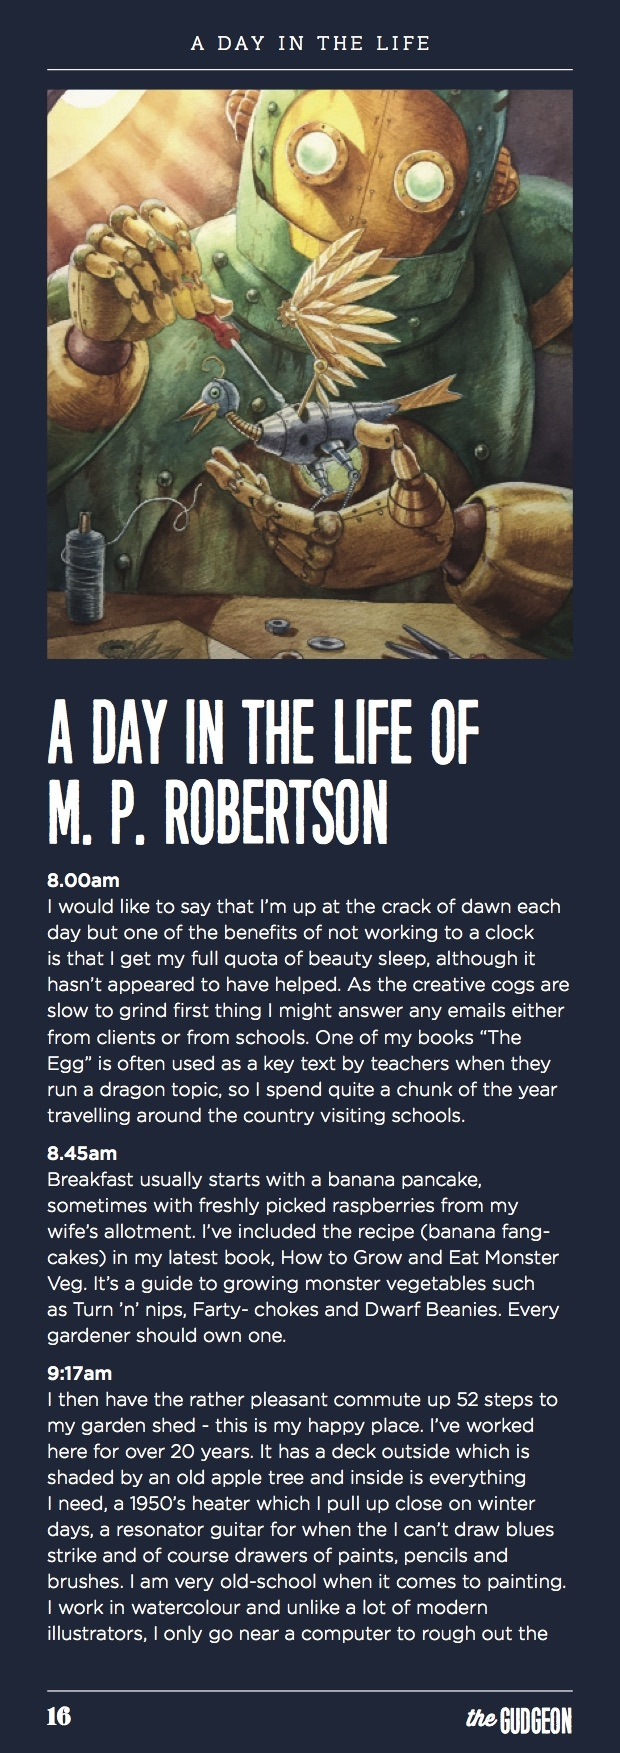 The Gudgeon M.P. Robertson